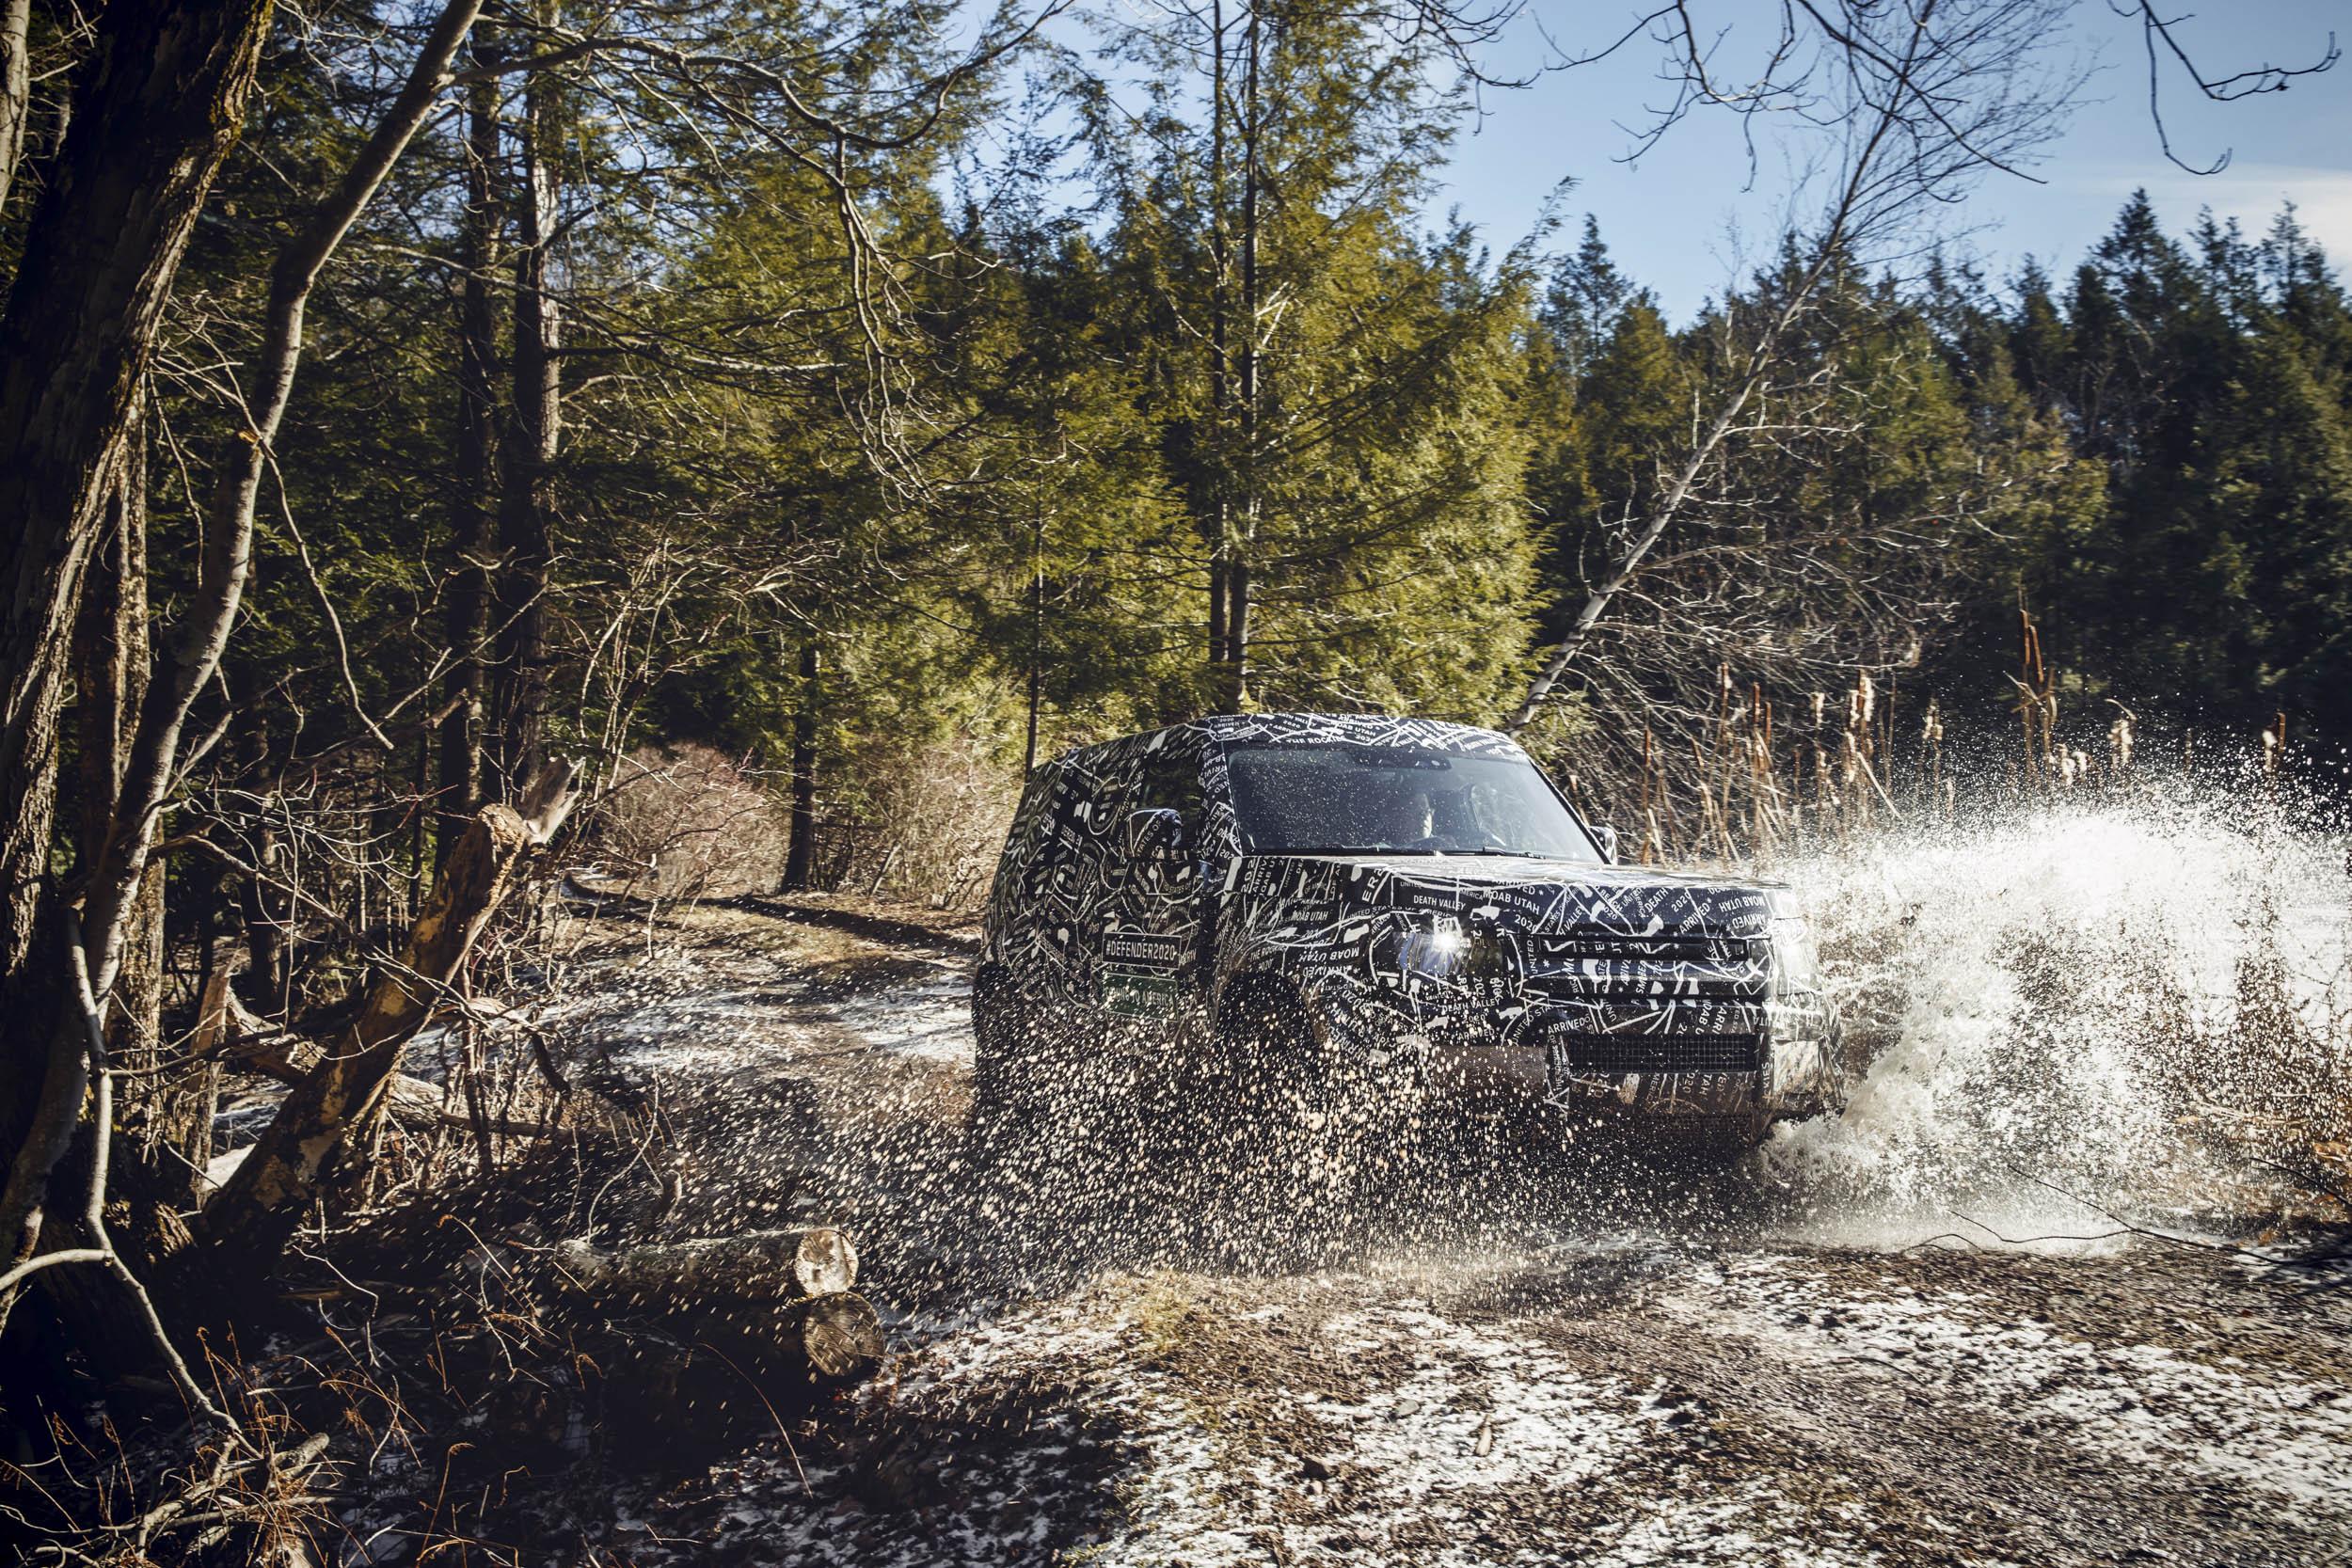 Land Rover splashing through a river